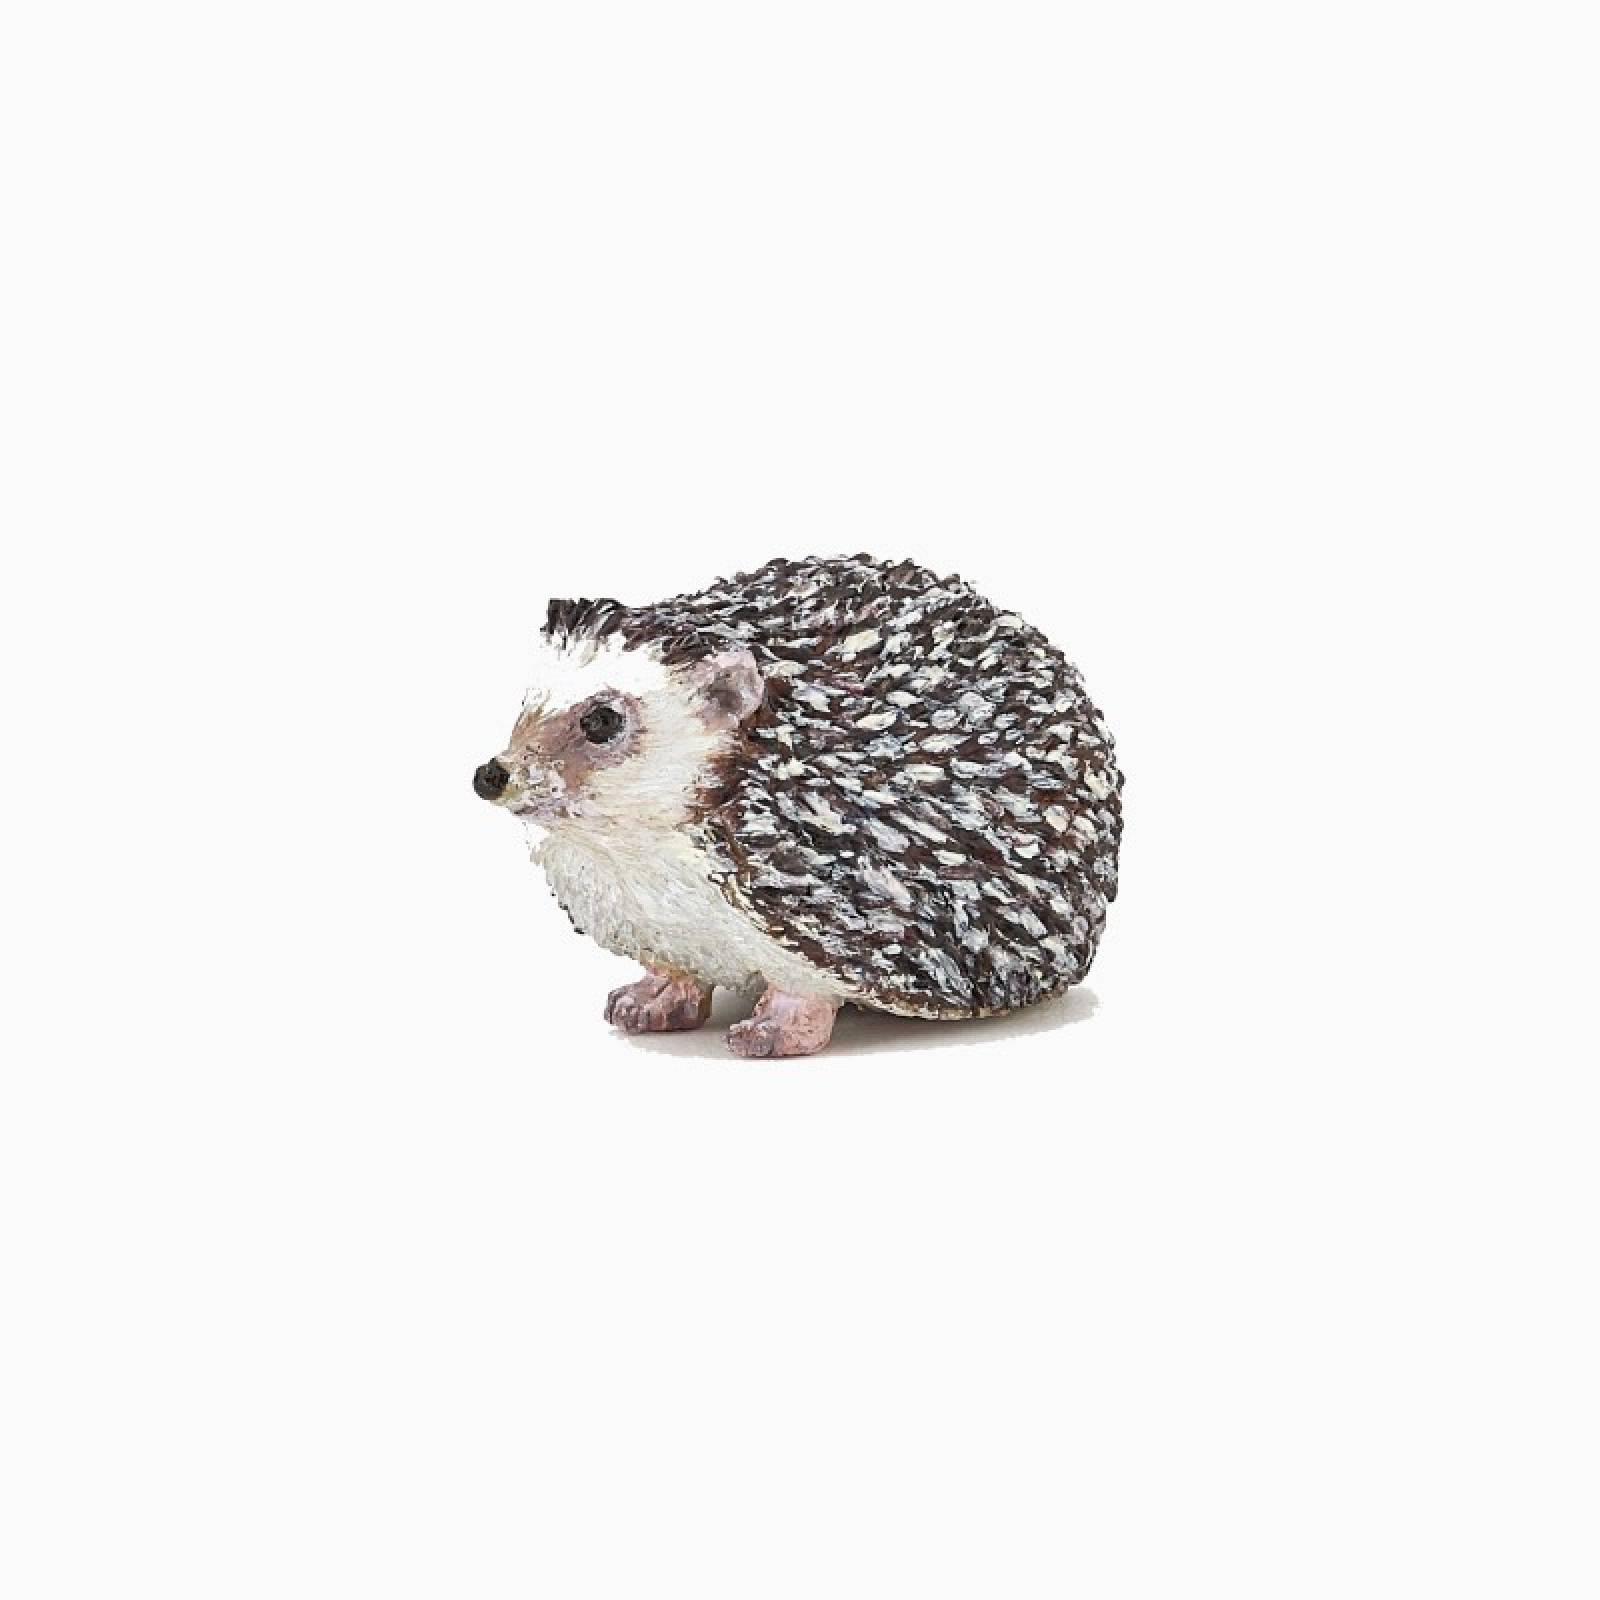 Hedgehog - Papo Farm Animal Figure